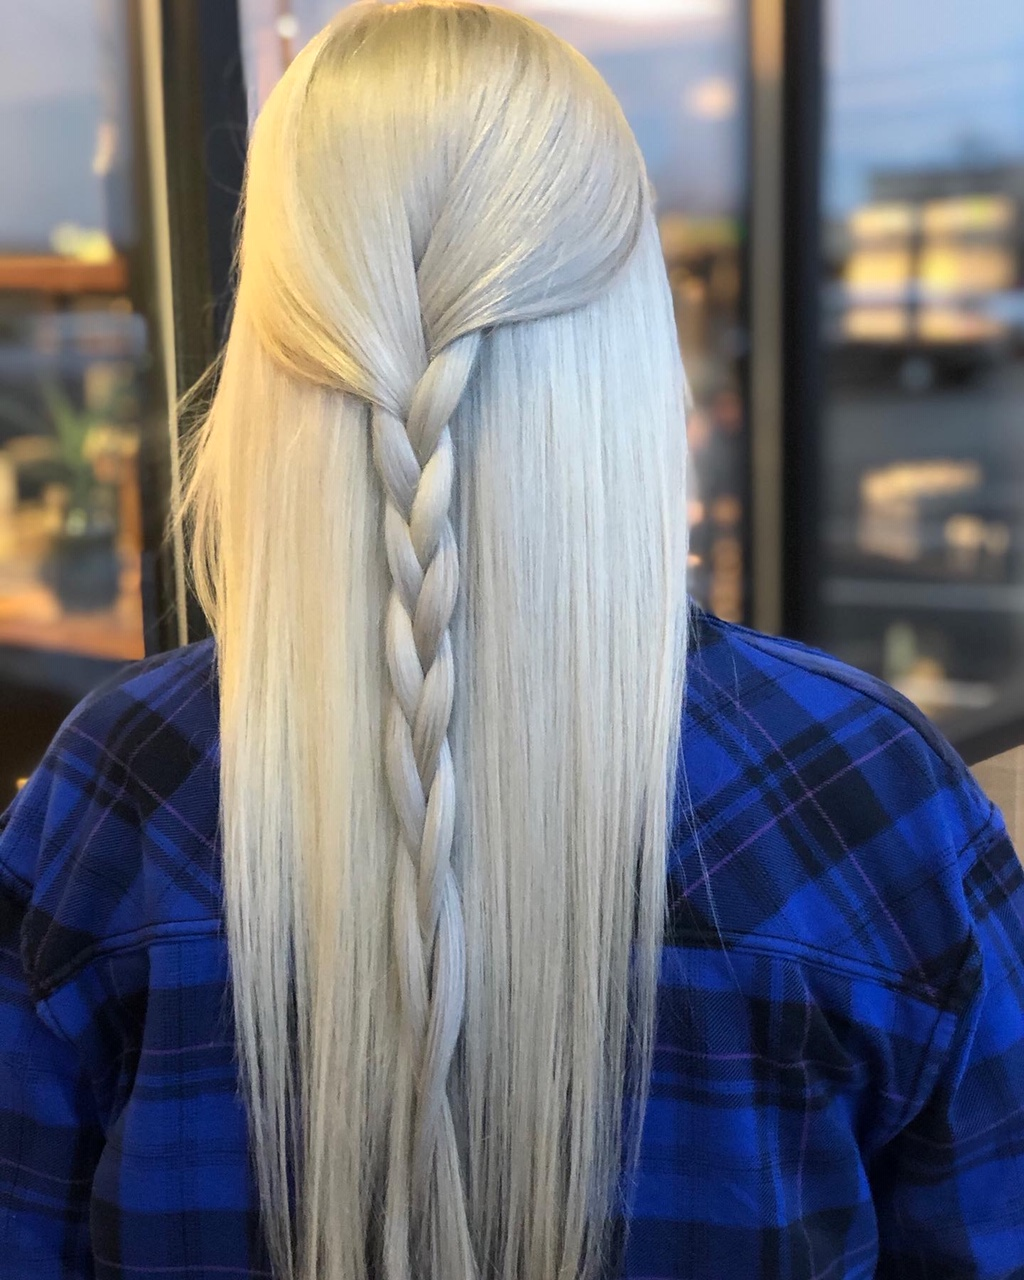 blonde braided hair